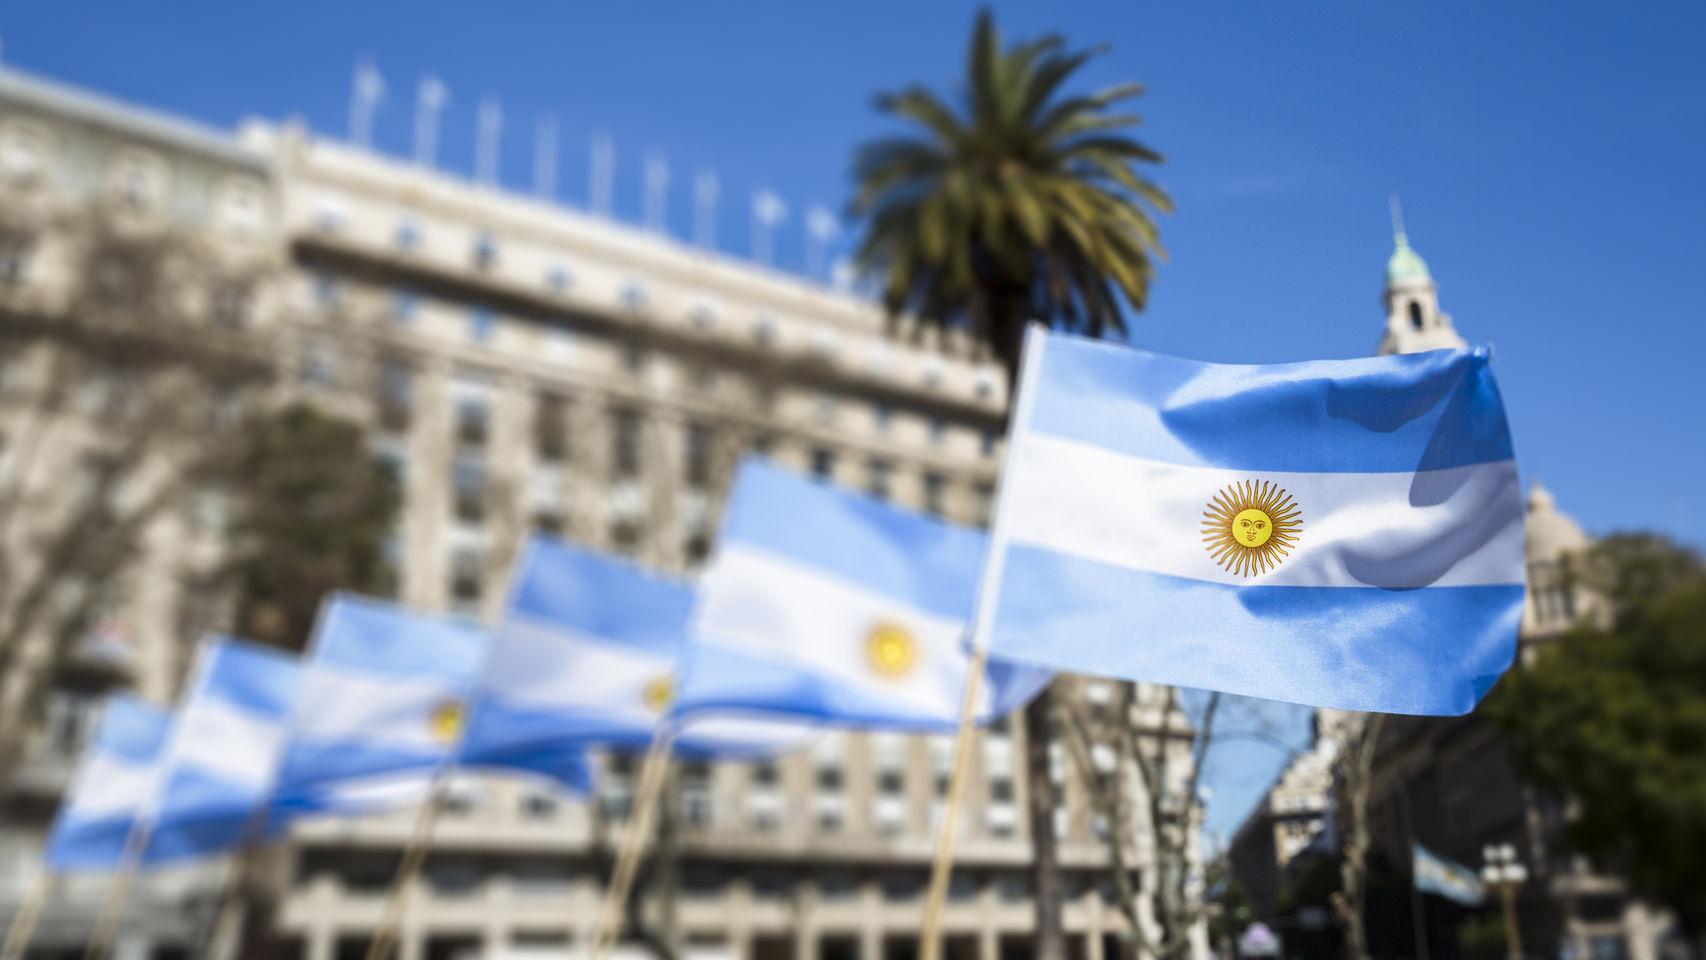 ocse previsioni economia argentina crisi